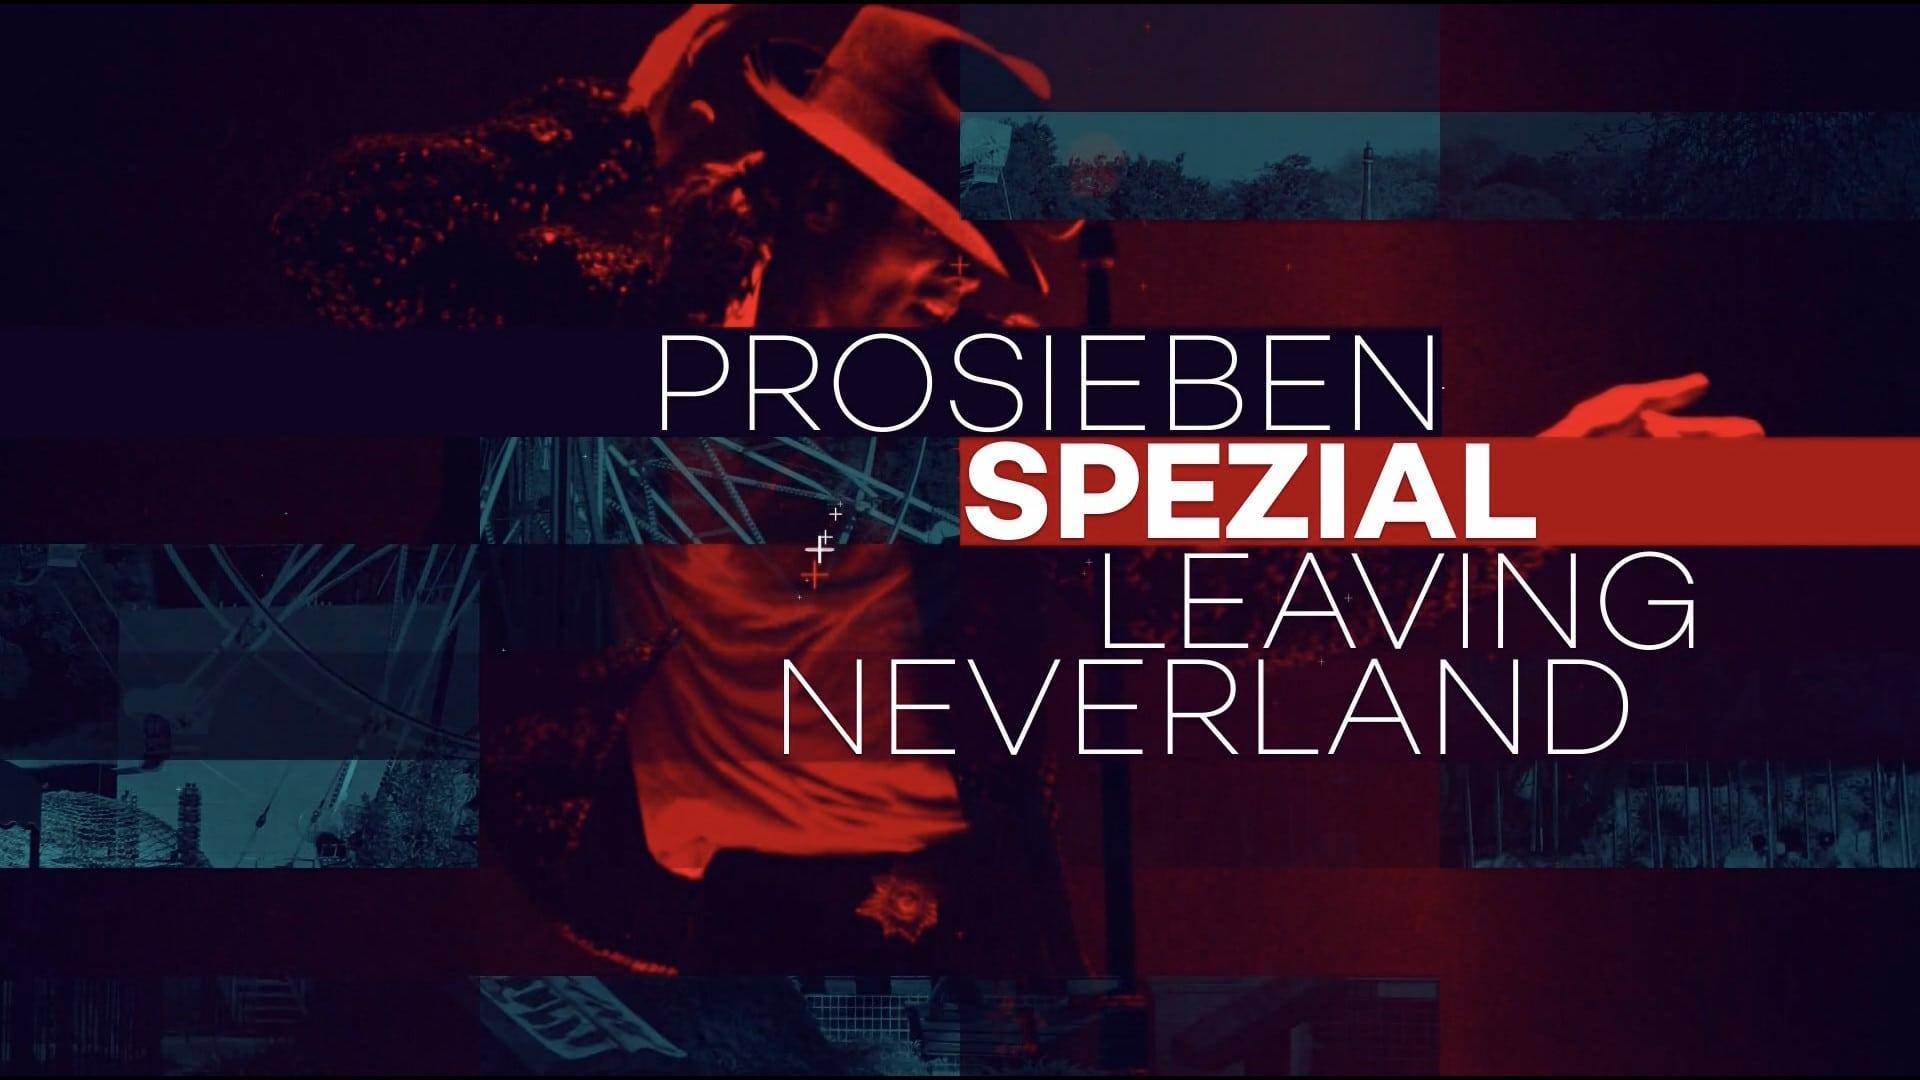 Leaving Neverland: ProSieben Spezial (2019)